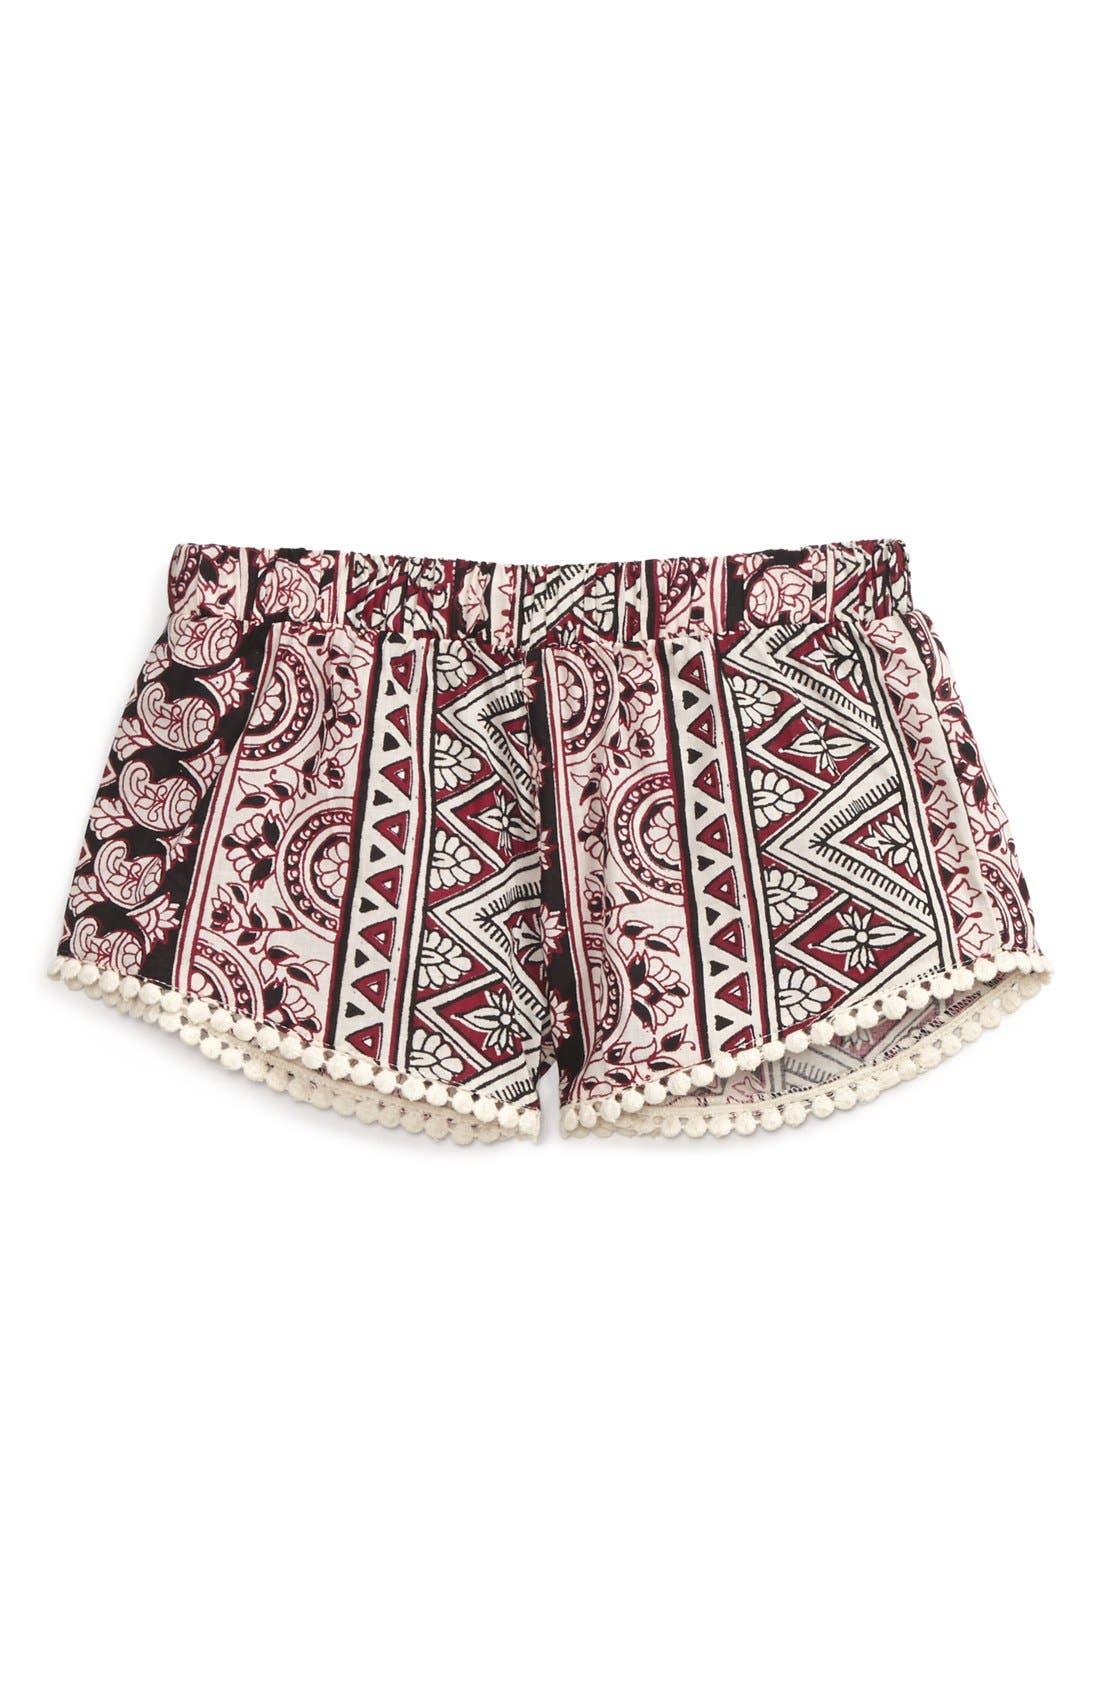 Alternate Image 1 Selected - Billabong 'Groovy Sea' Shorts (Little Girls)